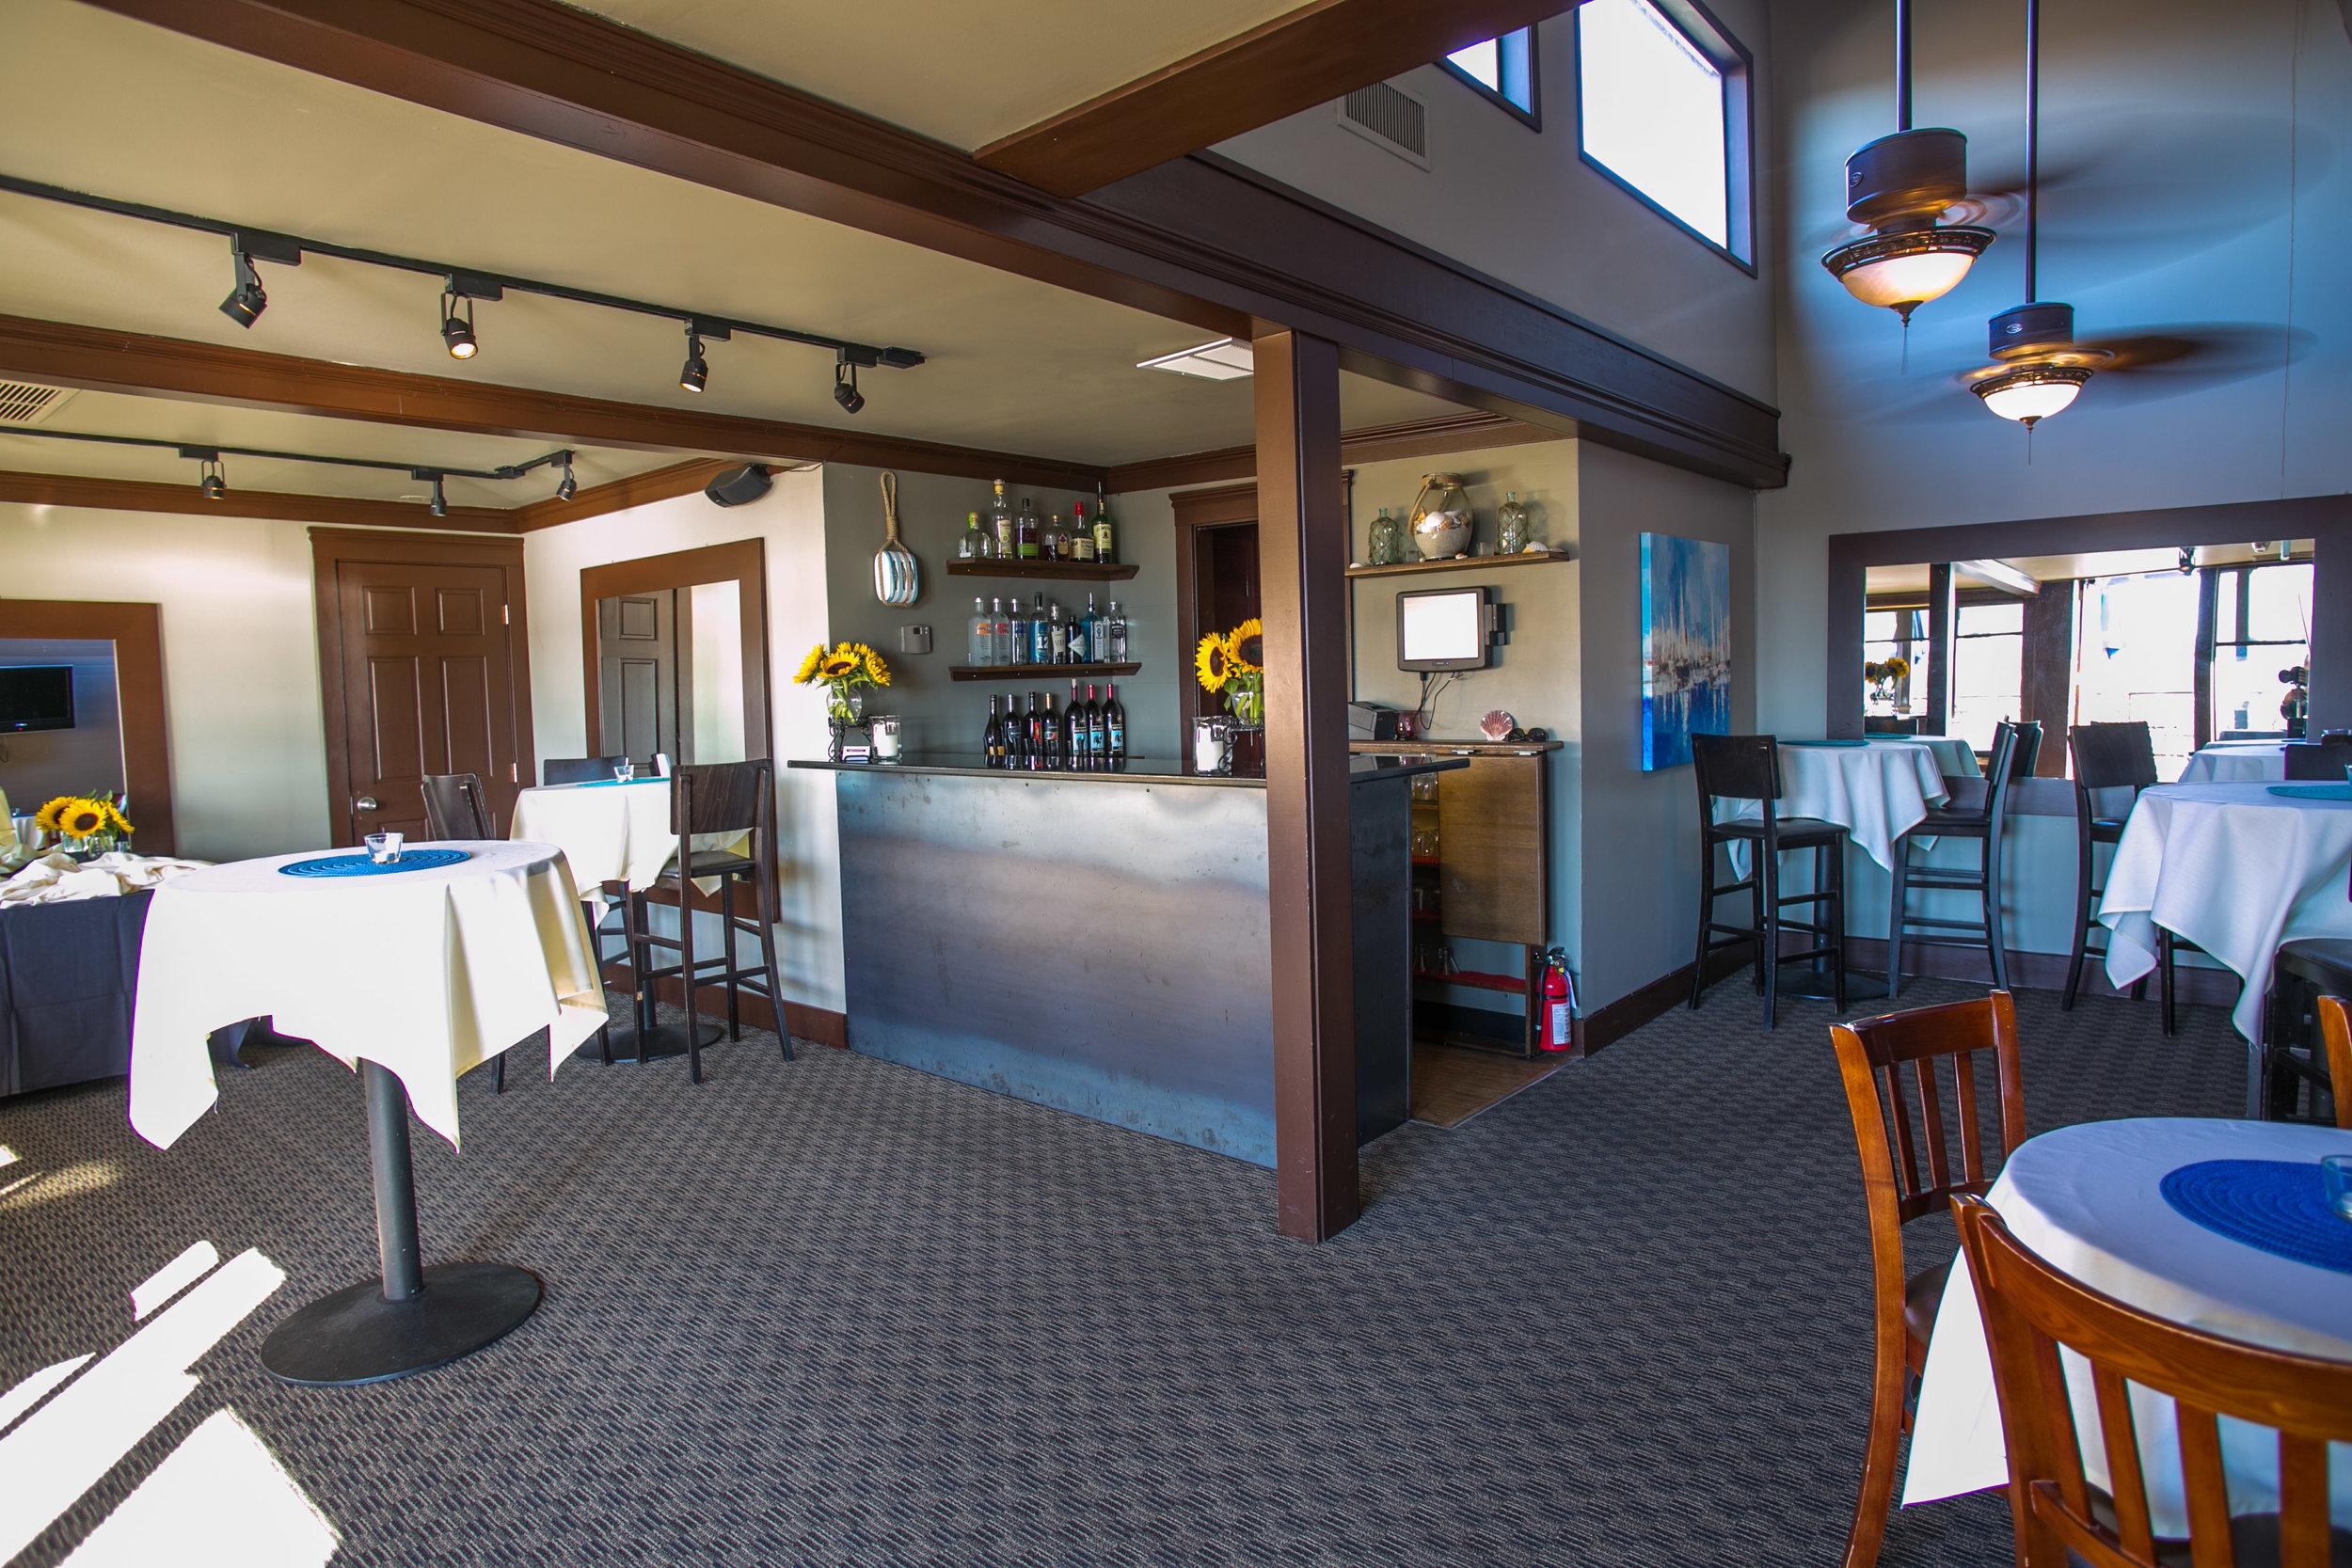 Eastlake Bar & Grill - Top Deck Lounge